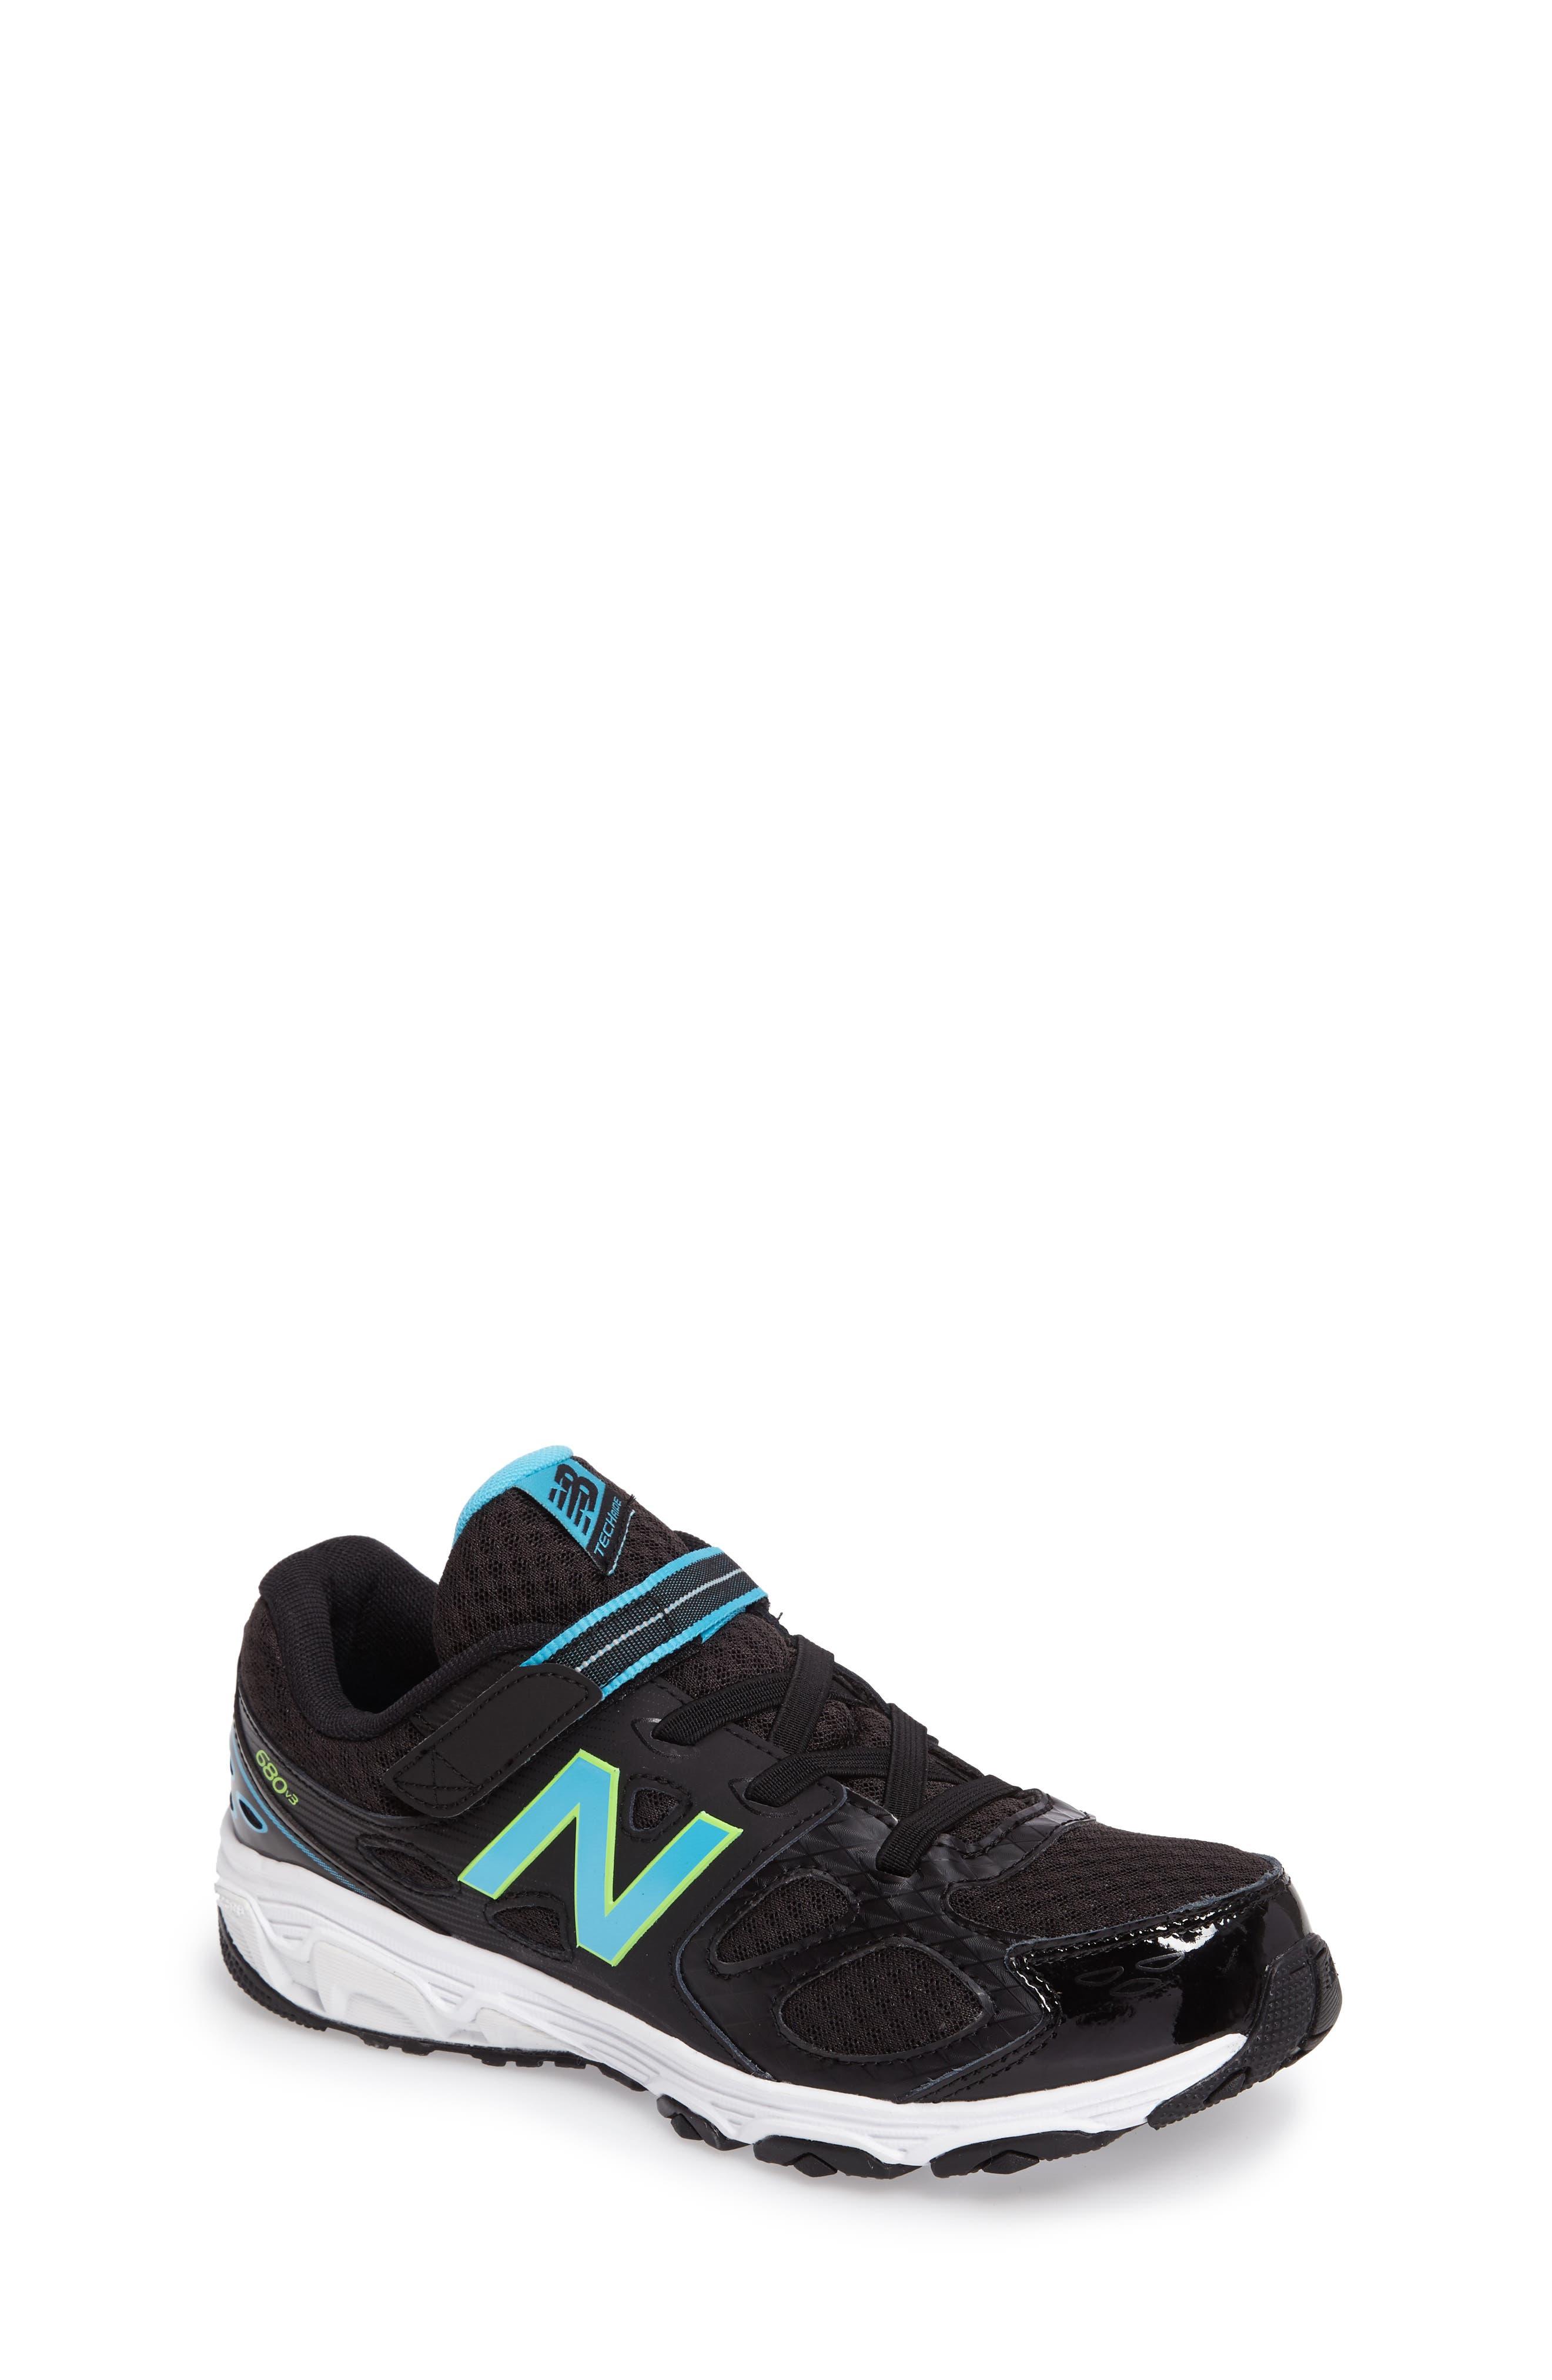 680v3 Sneaker,                         Main,                         color, BLACK/BLUE